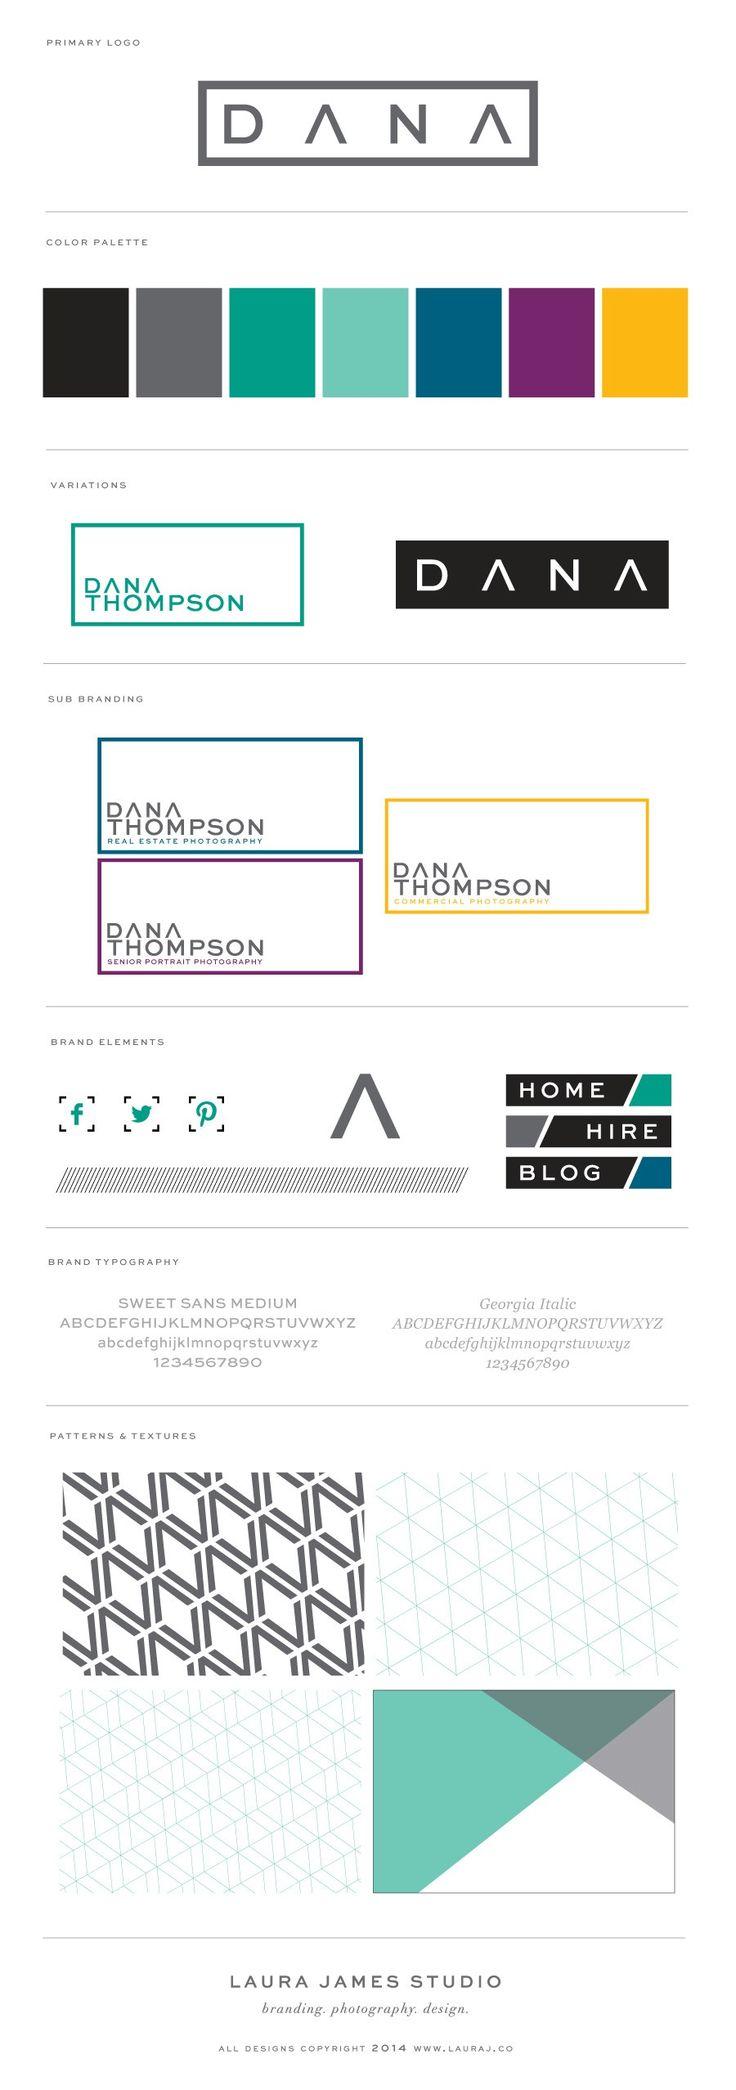 Dana Thompson Photography Brand Launch - Laura James Studio >> Branding Photography Design